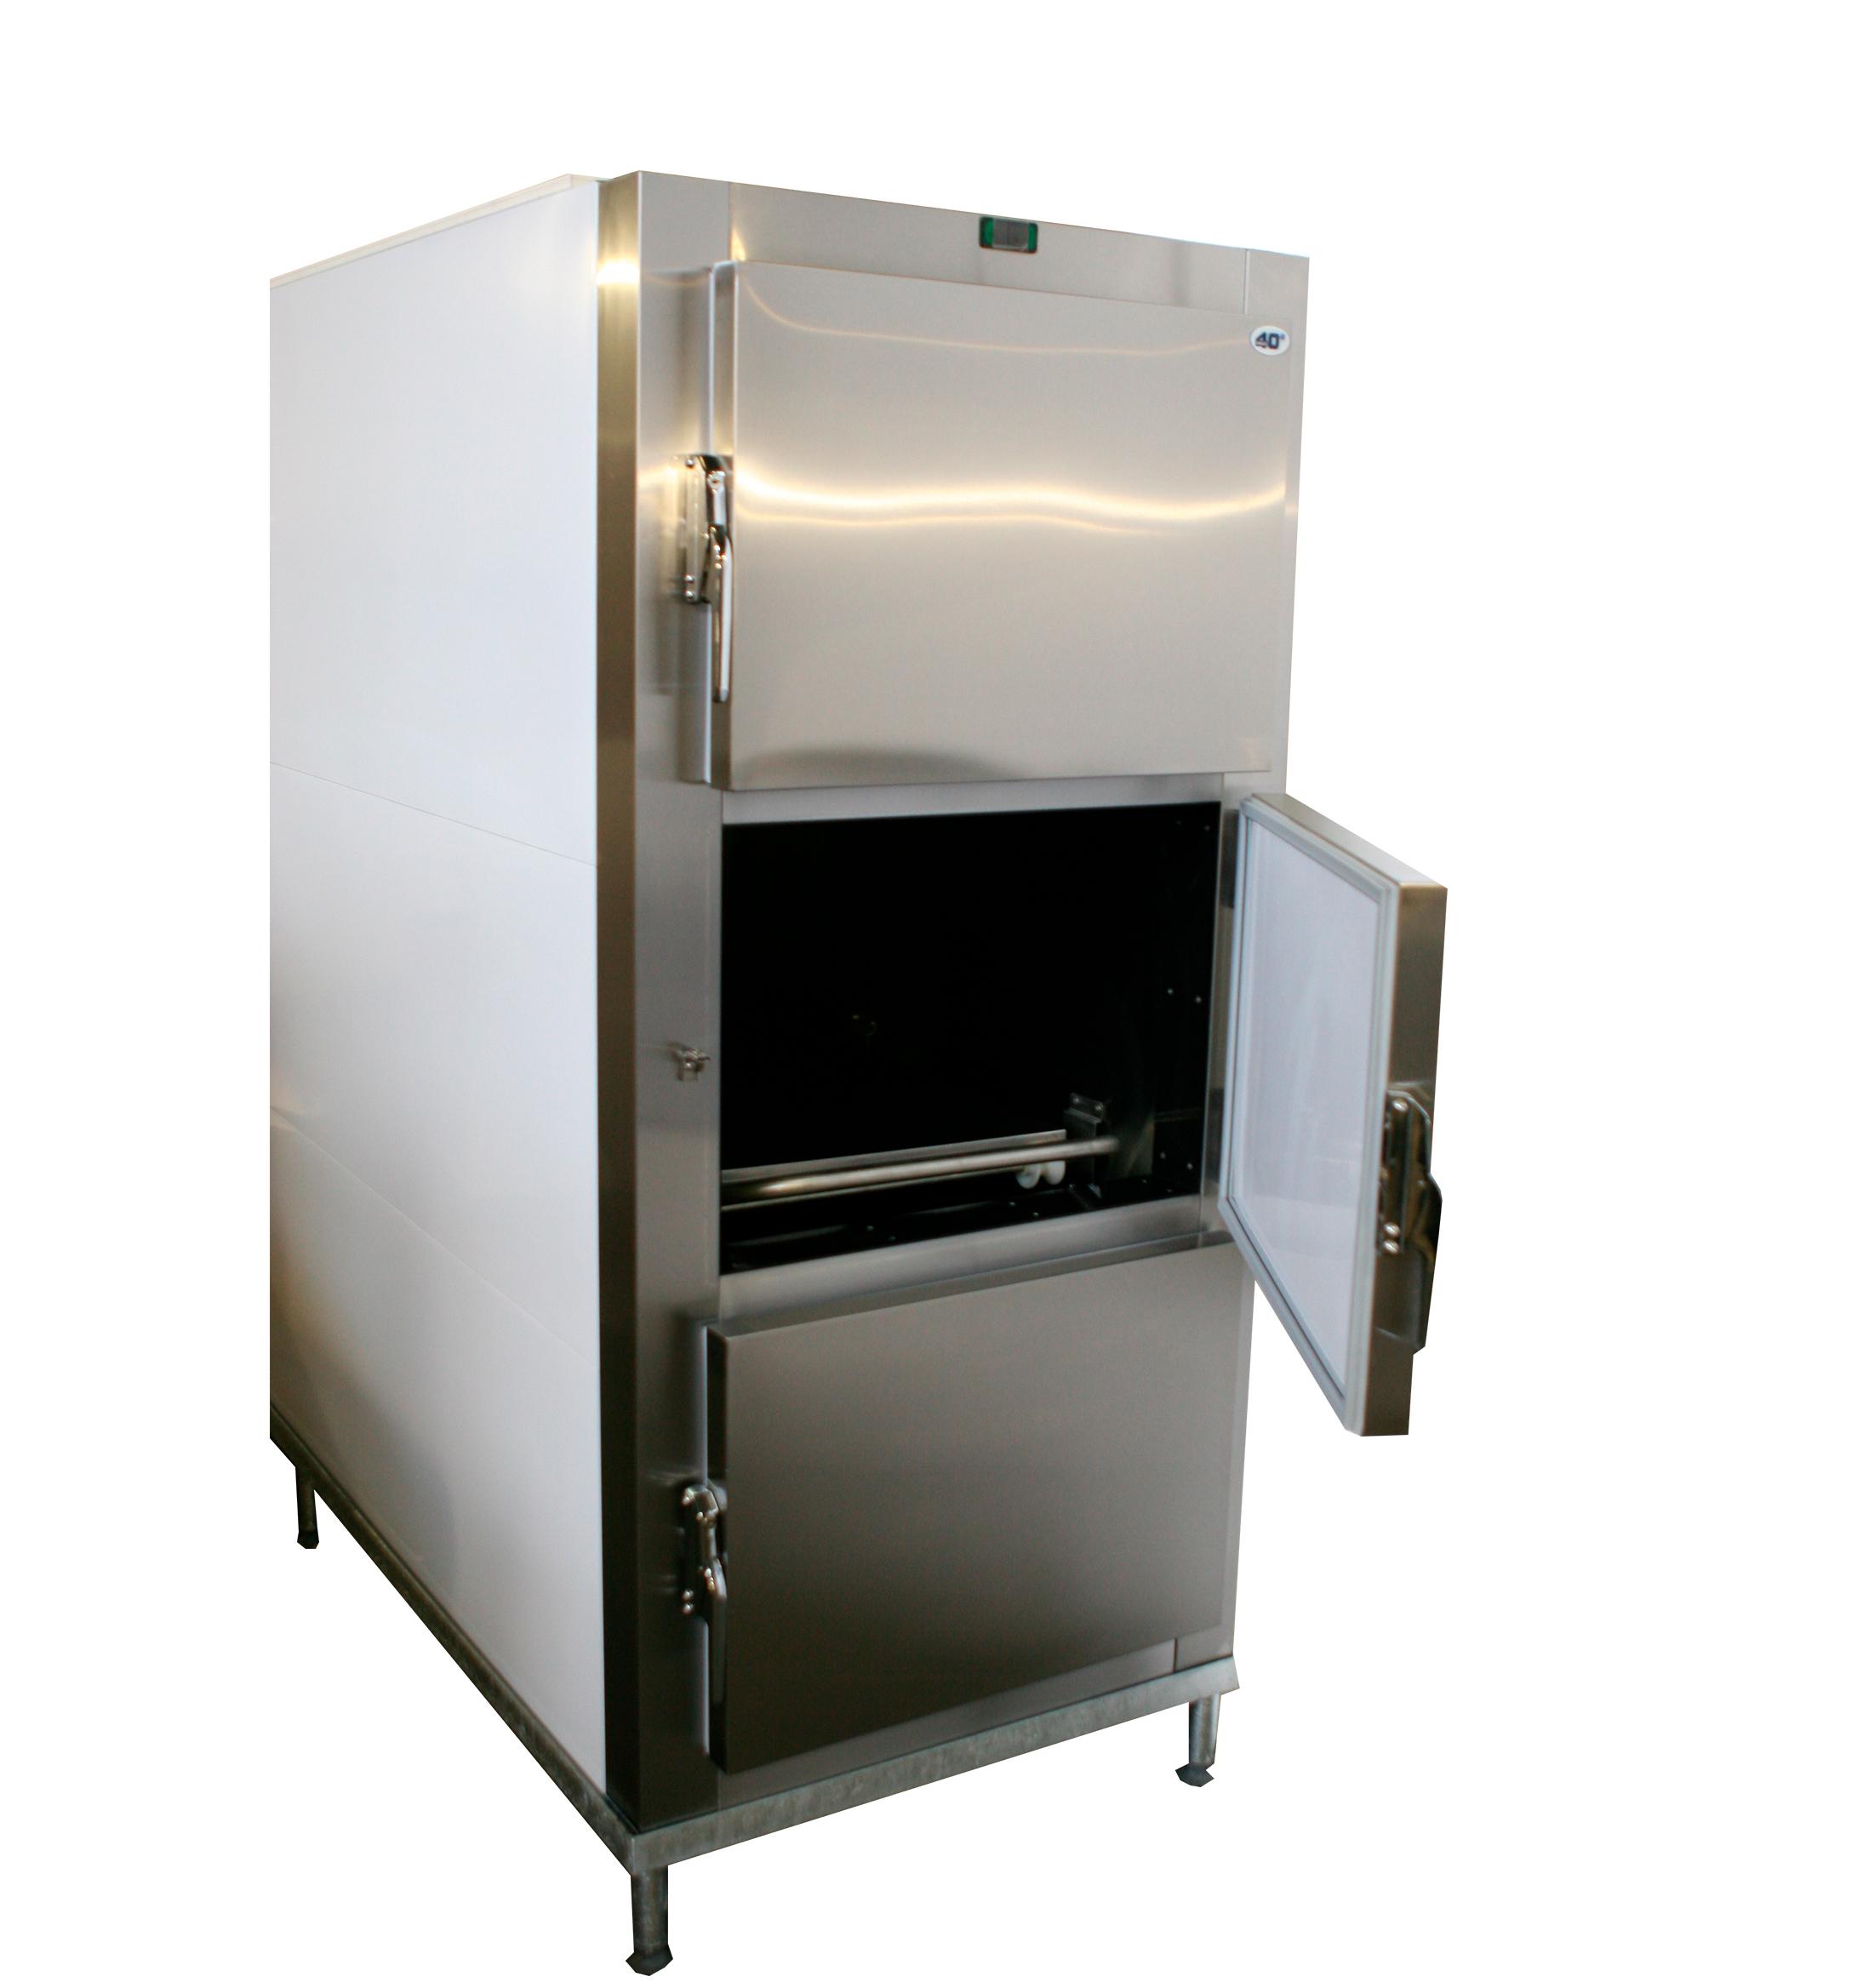 3 Tier Mortuary Refrigerator Cabinet Fridge or Freezer - Minus40